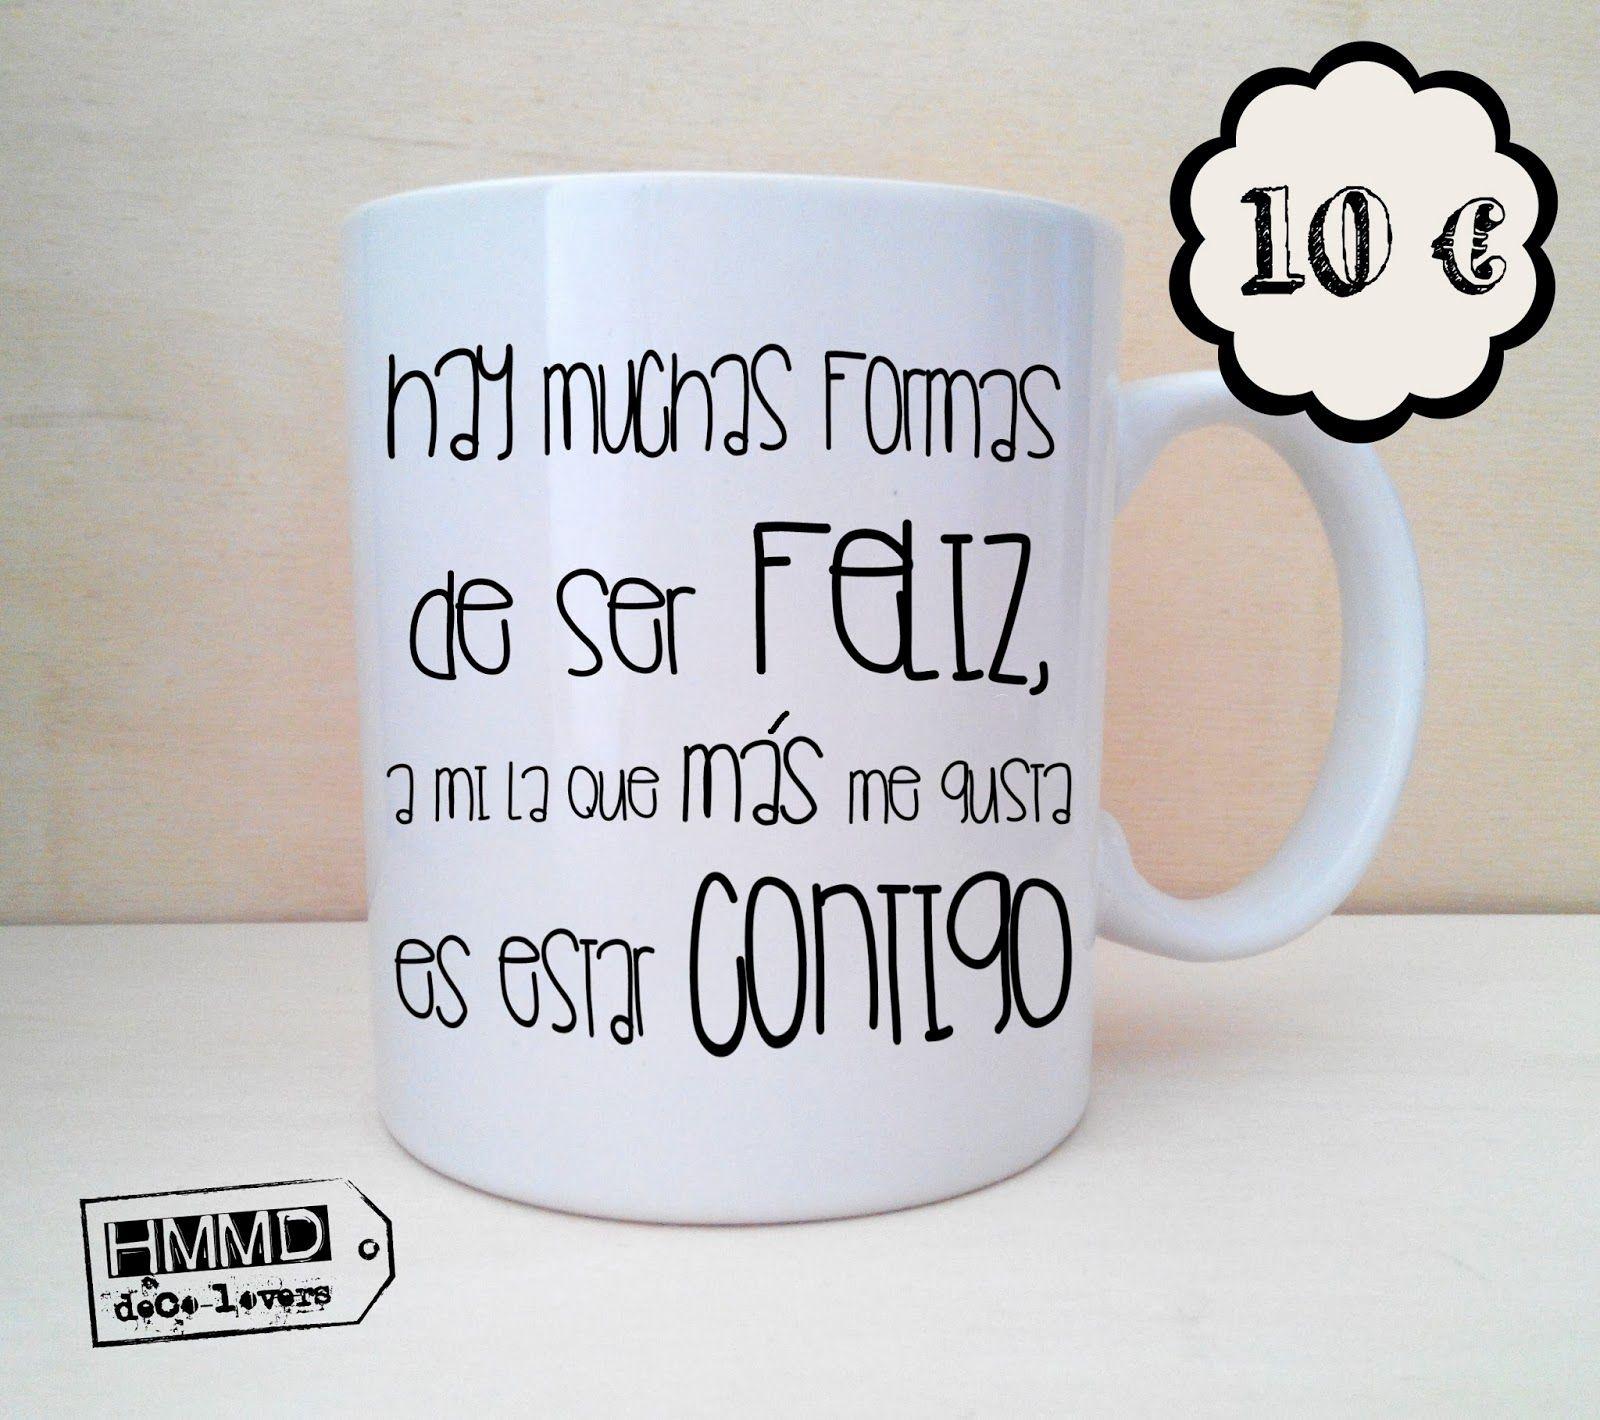 Colección De Tazas In Love In Love Mugs Collection